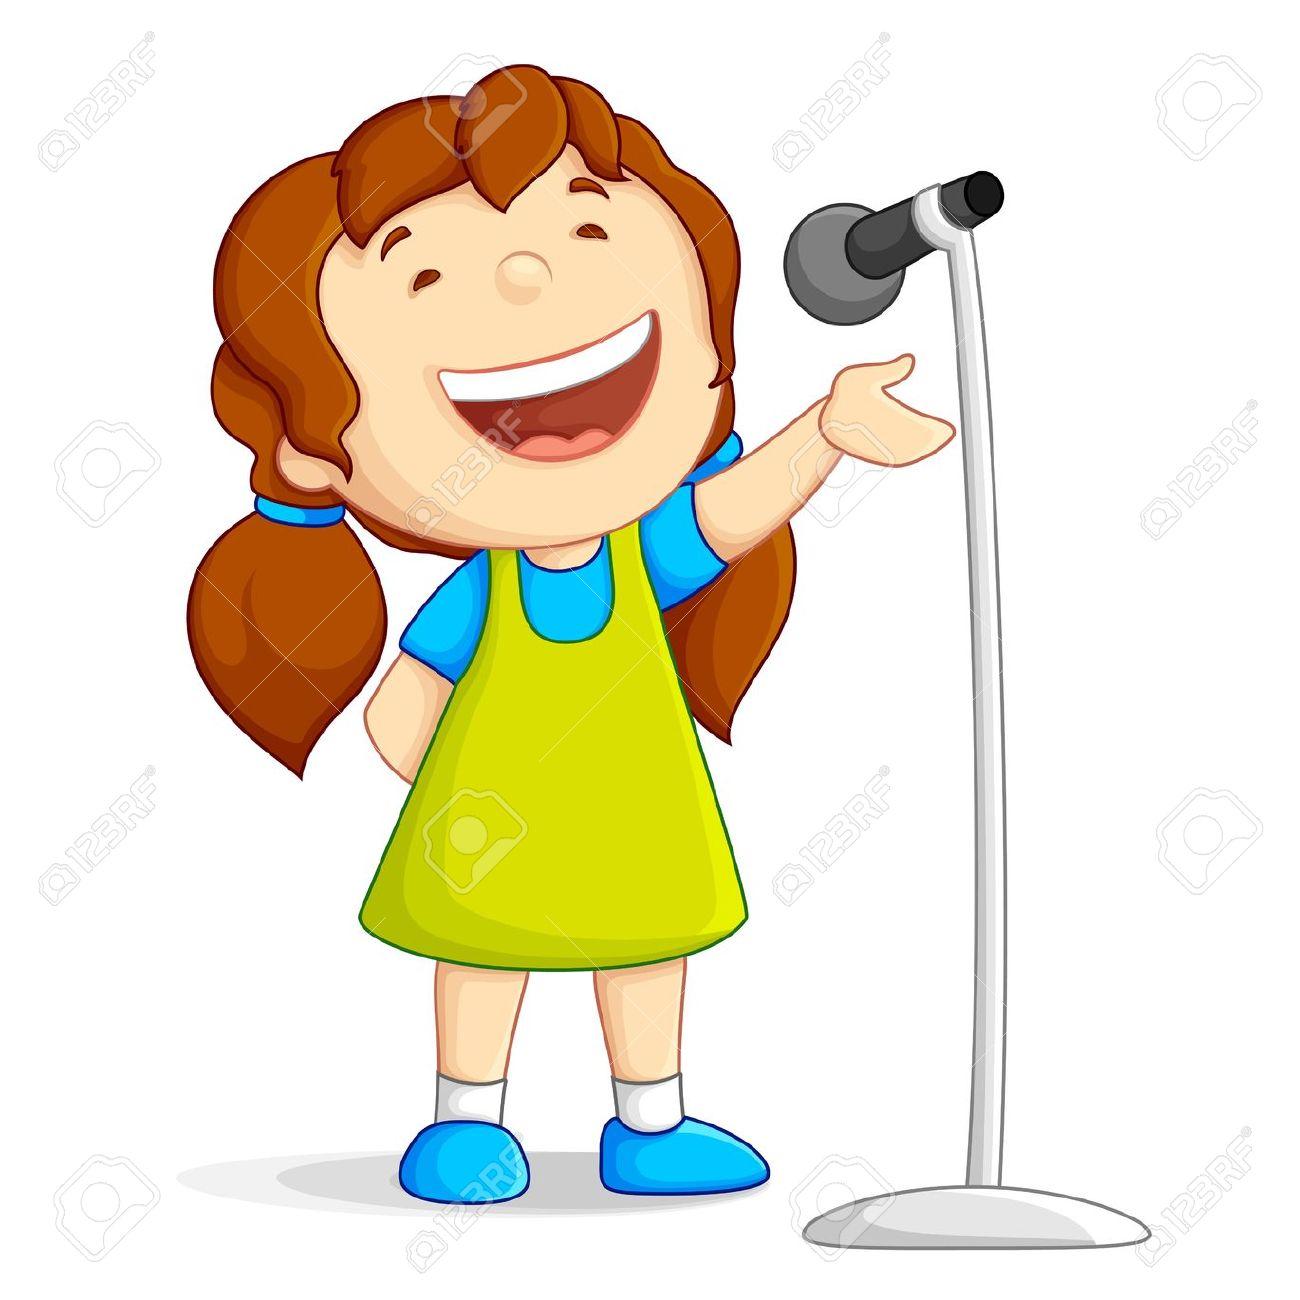 Singing Clip Art - Getbellhop